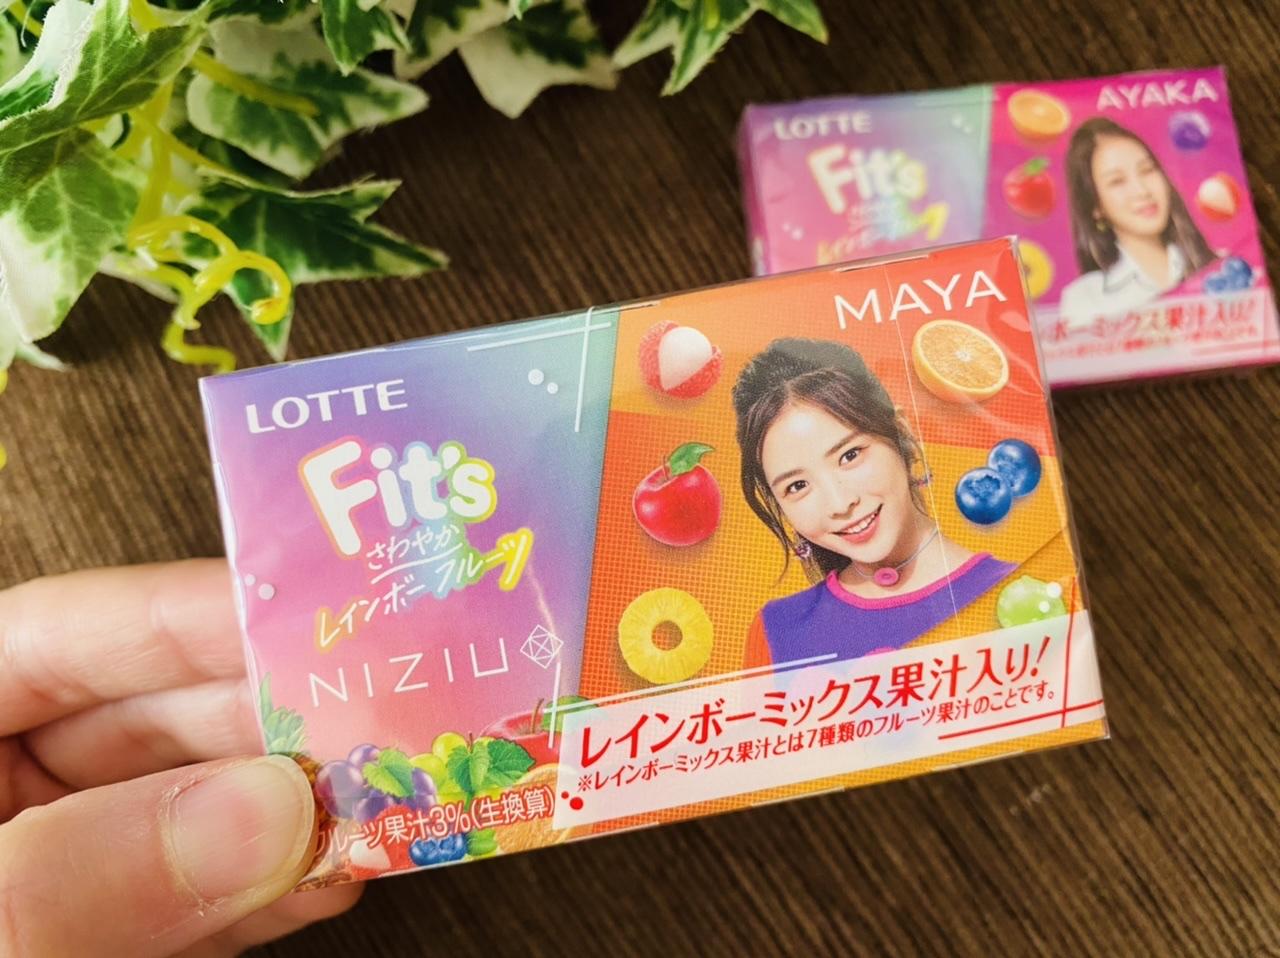 【NiziU× Fit's】パケ買い必至★全メンバー揃えたい!《コラボガム》が可愛すぎ♡_4